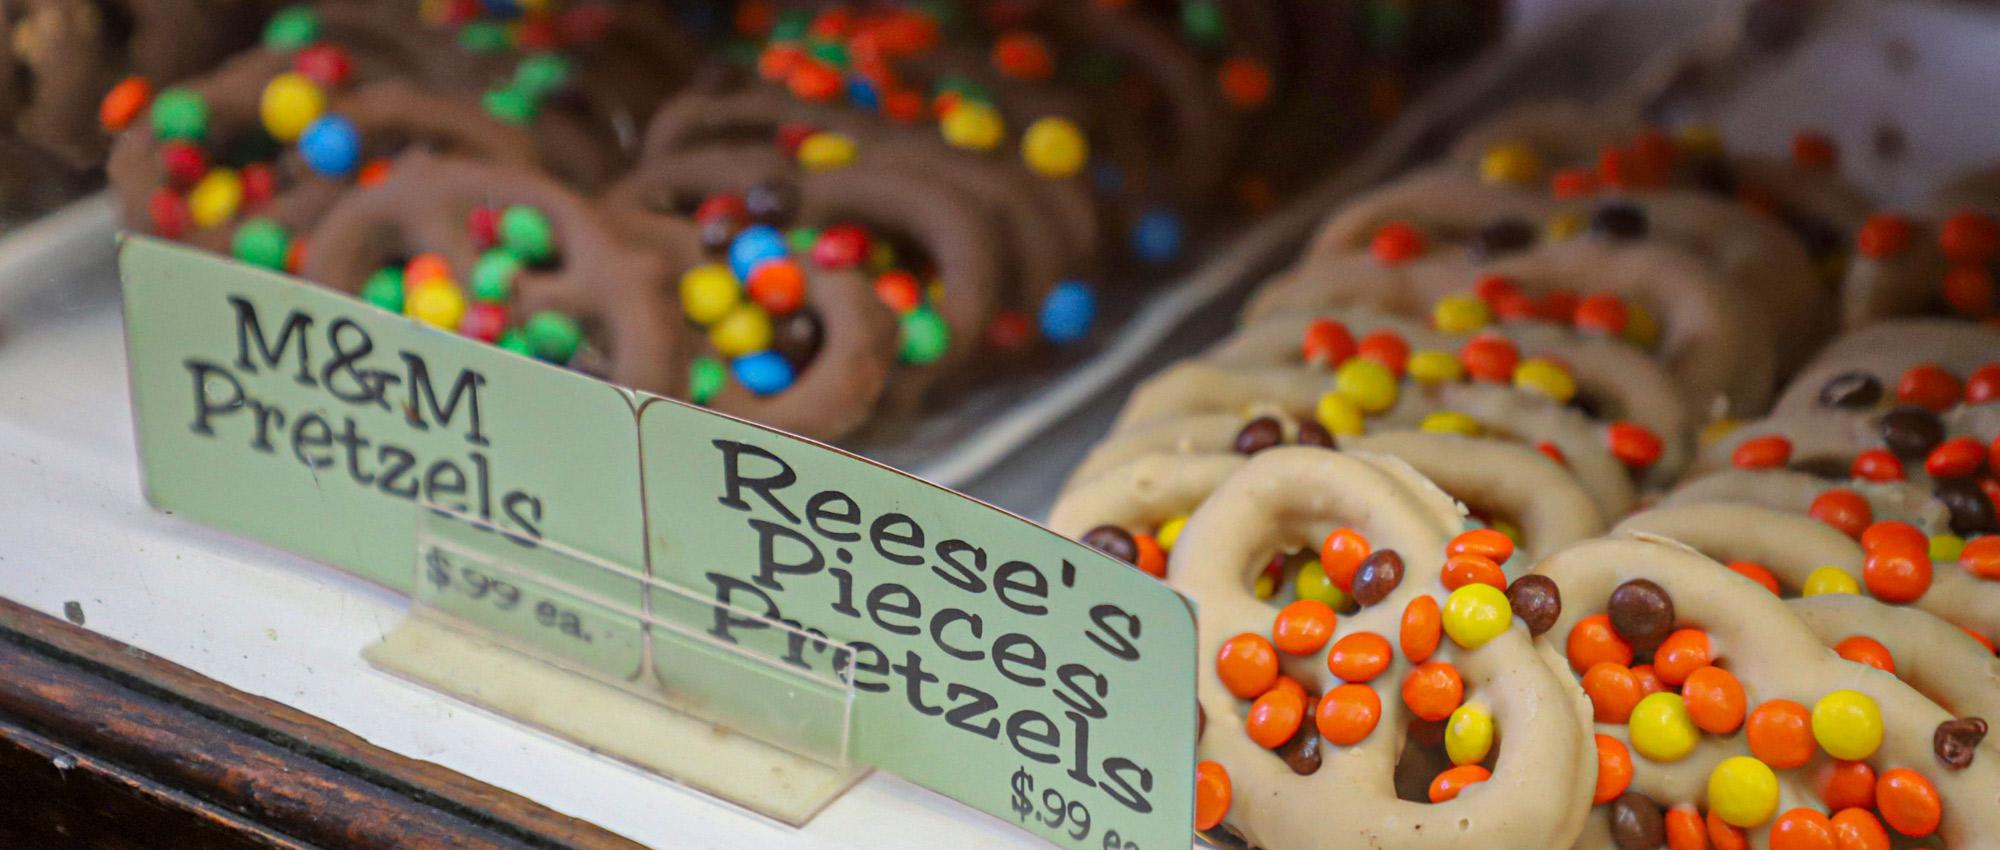 Sweeties Homemade Ice Cream & Sweets